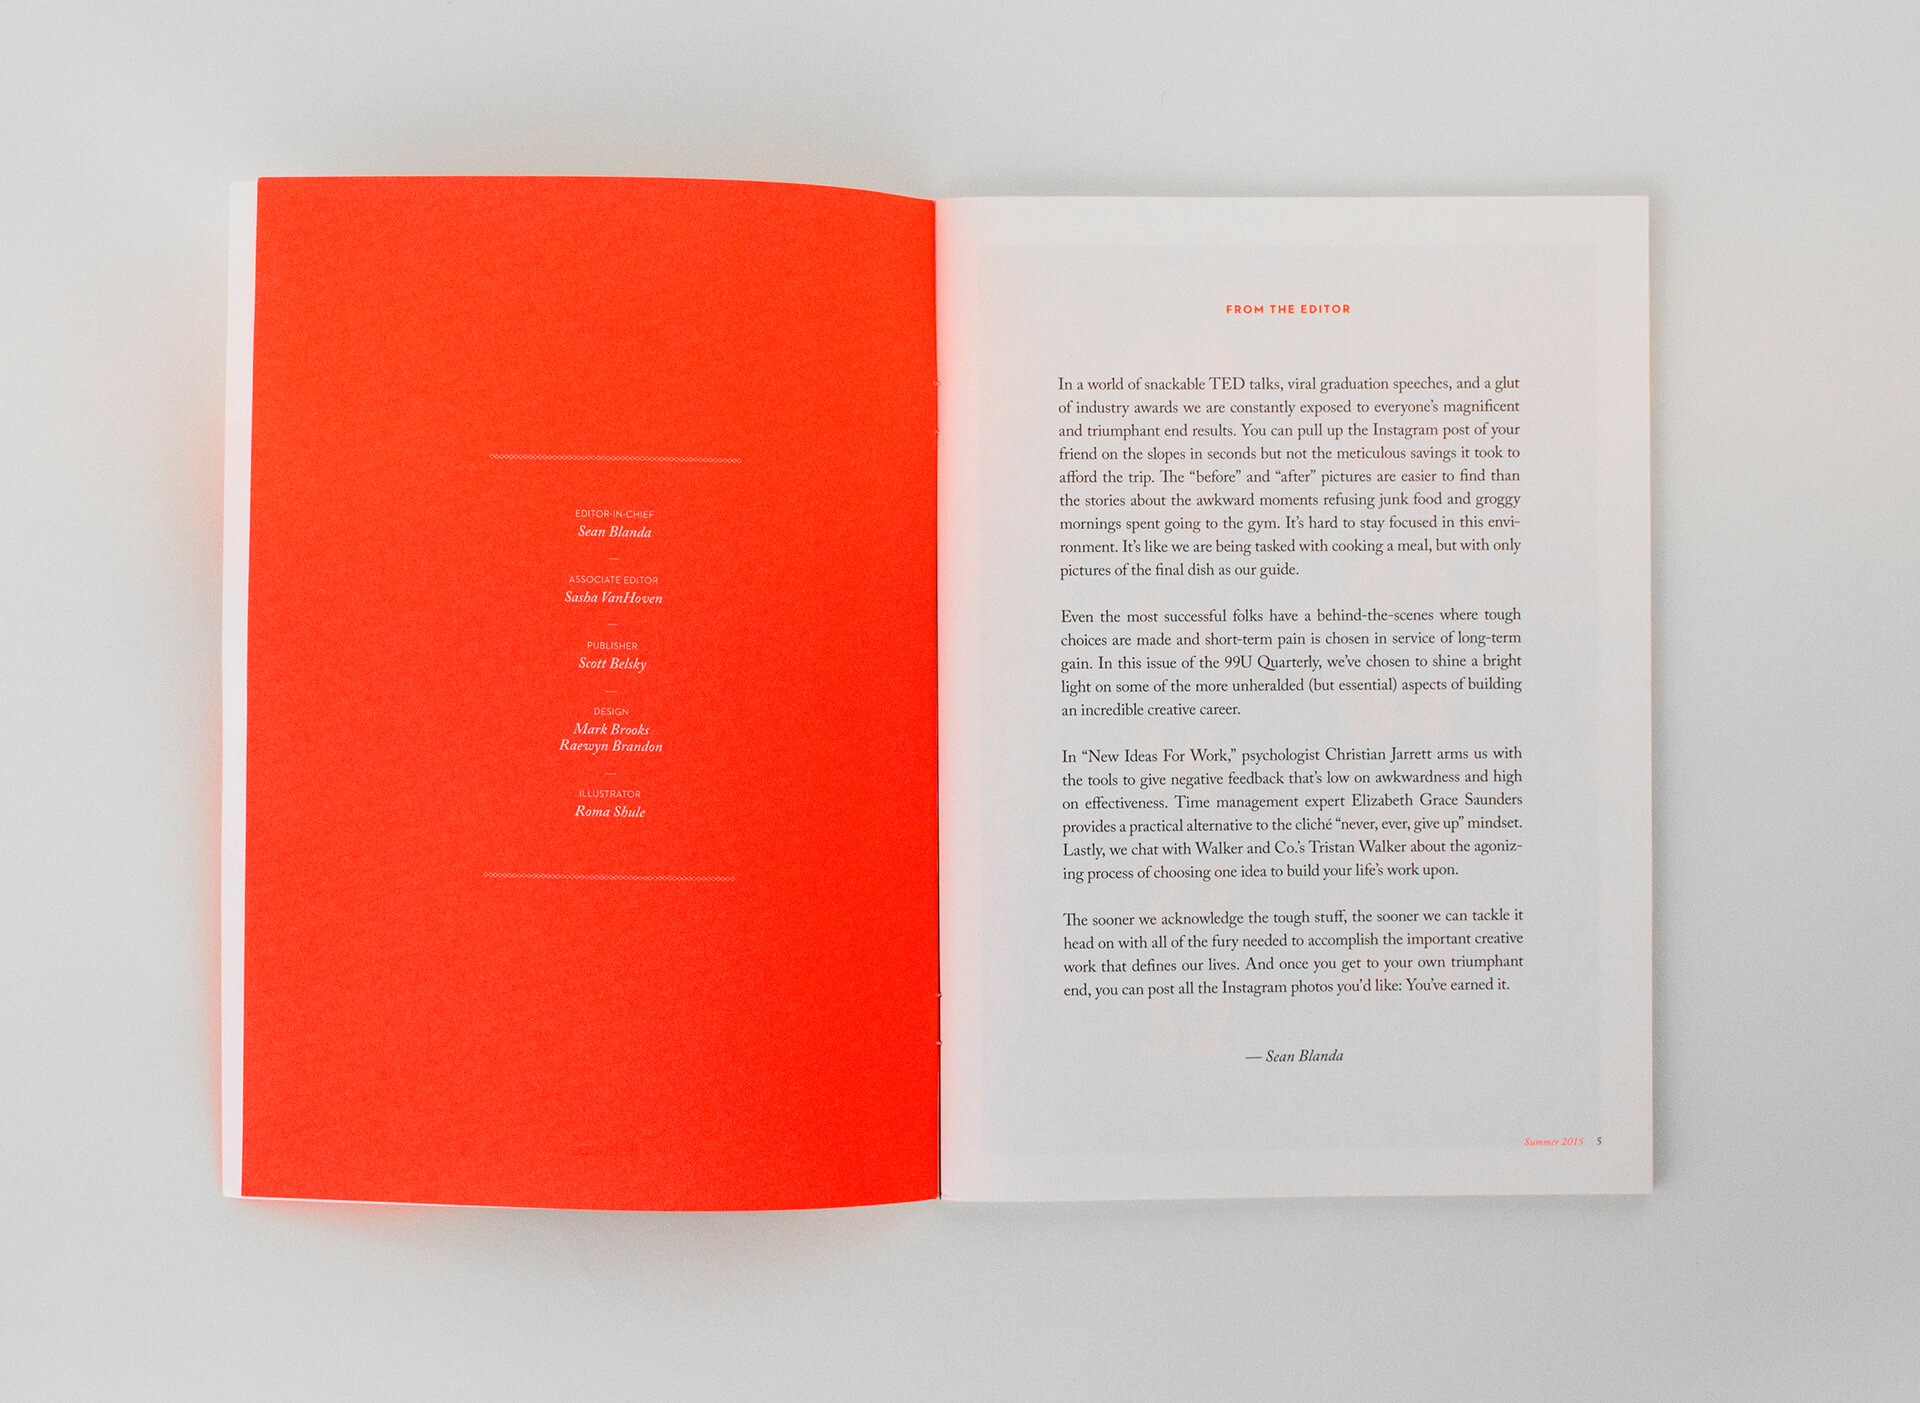 99U-Quarterly-Issue-6-05